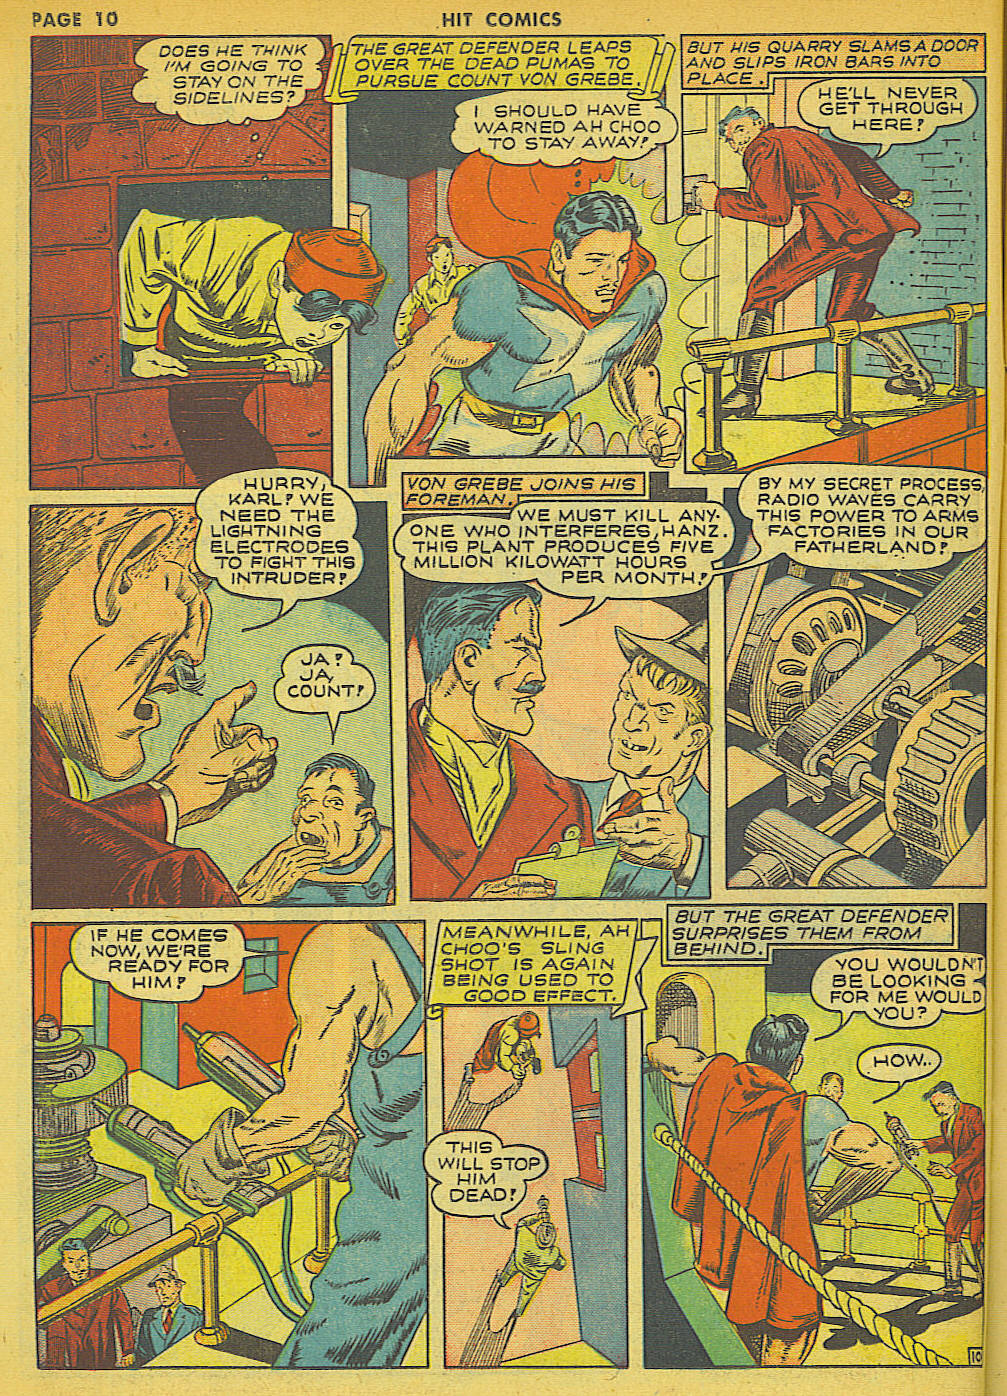 Read online Hit Comics comic -  Issue #21 - 12